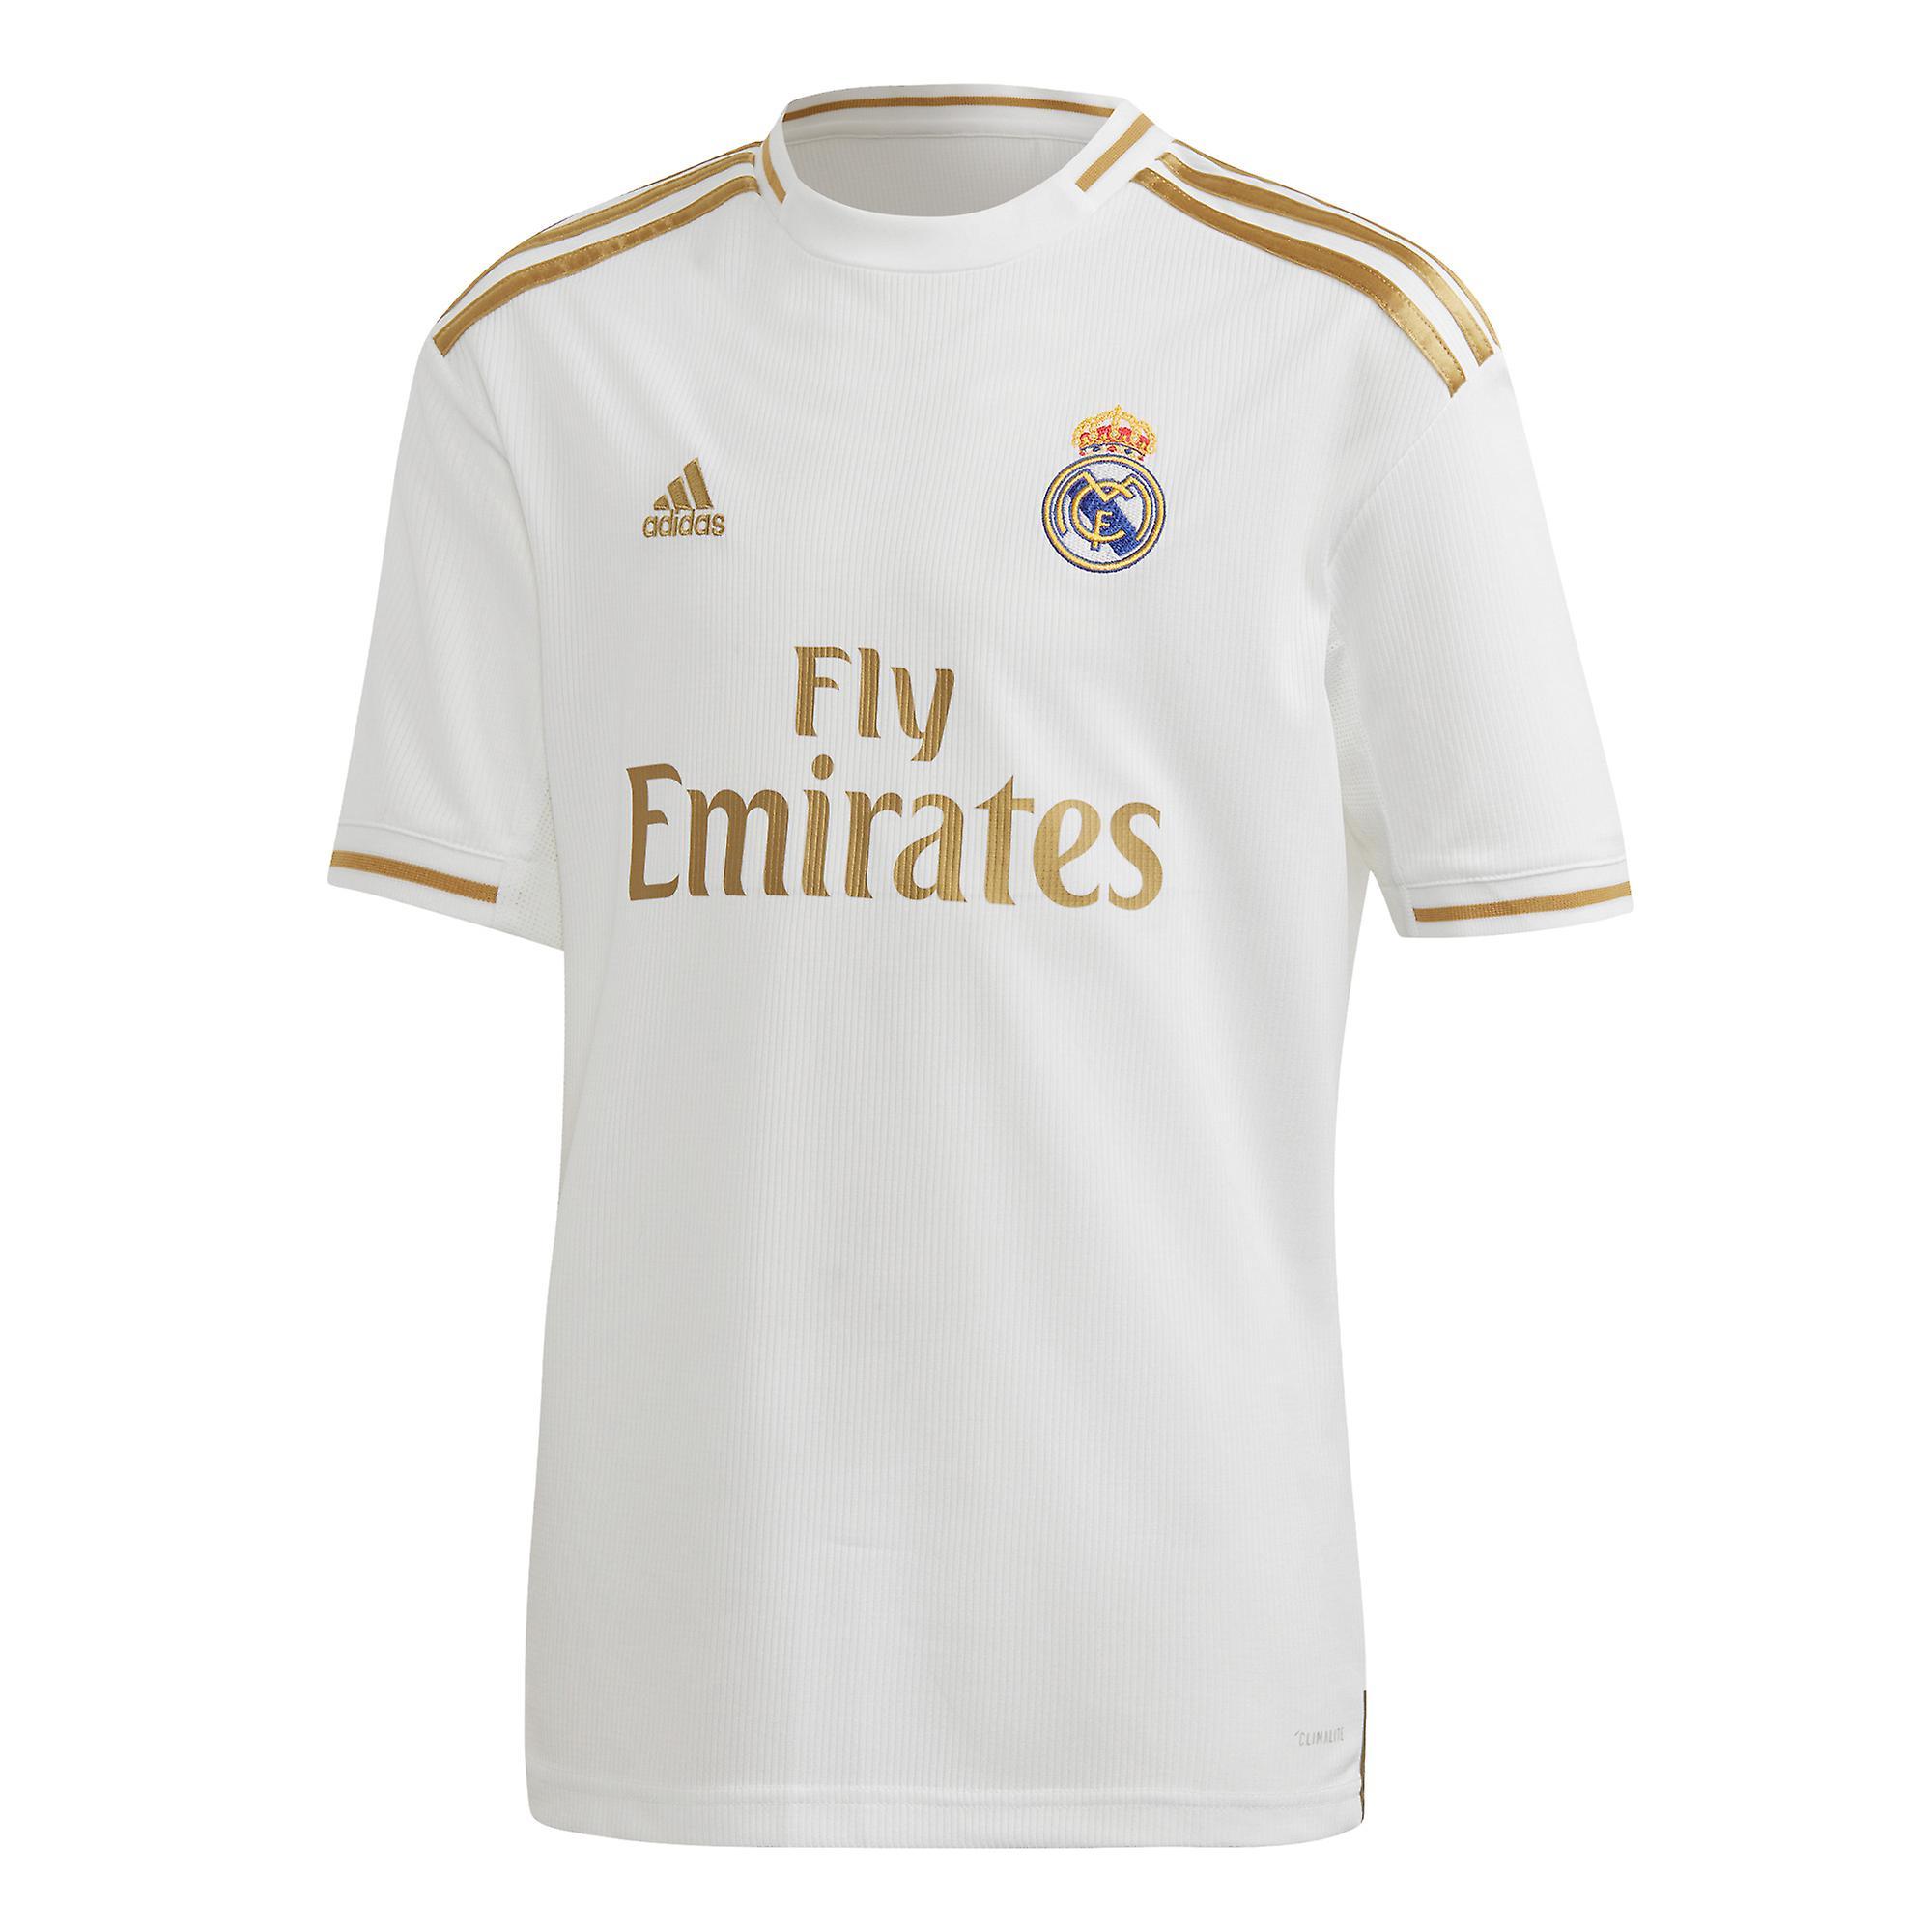 huge selection of 89fa6 3b061 adidas Real Madrid 2019/20 Kids Football Home Kit Set White/Gold